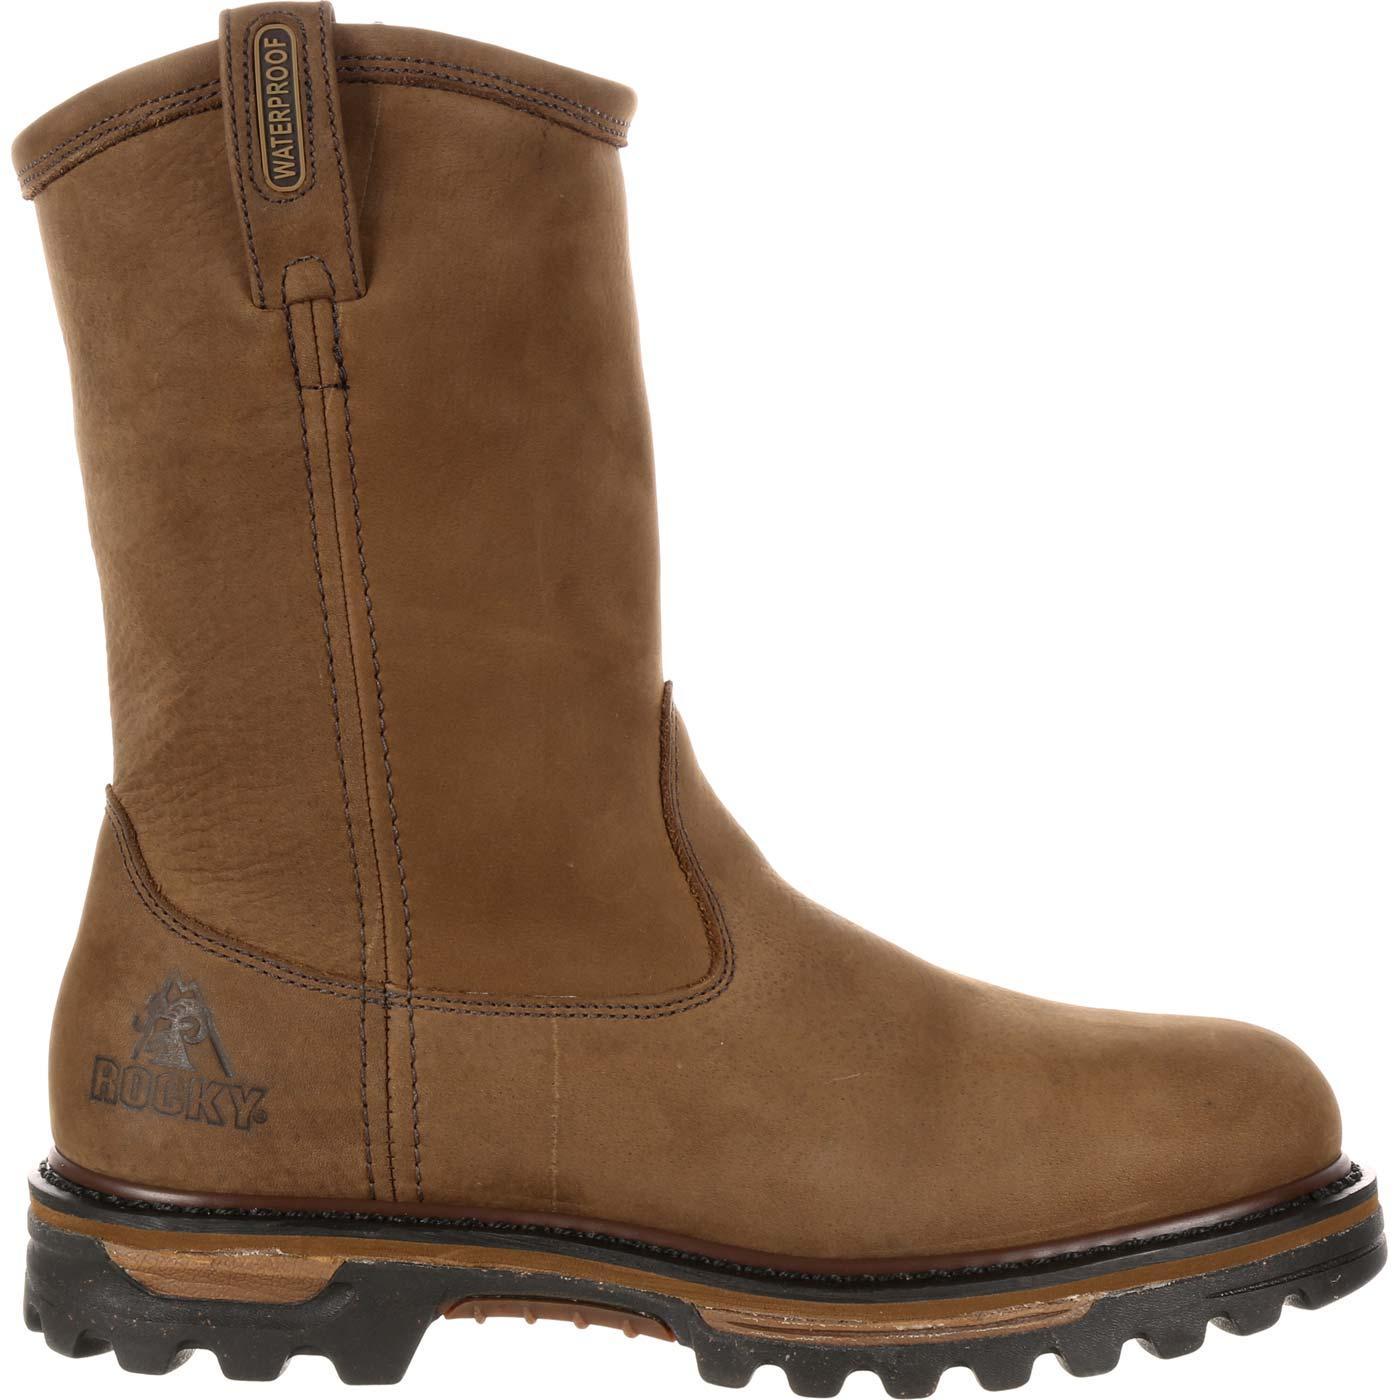 7333315331c Rocky Ironclad Waterproof Wellington Work Boot